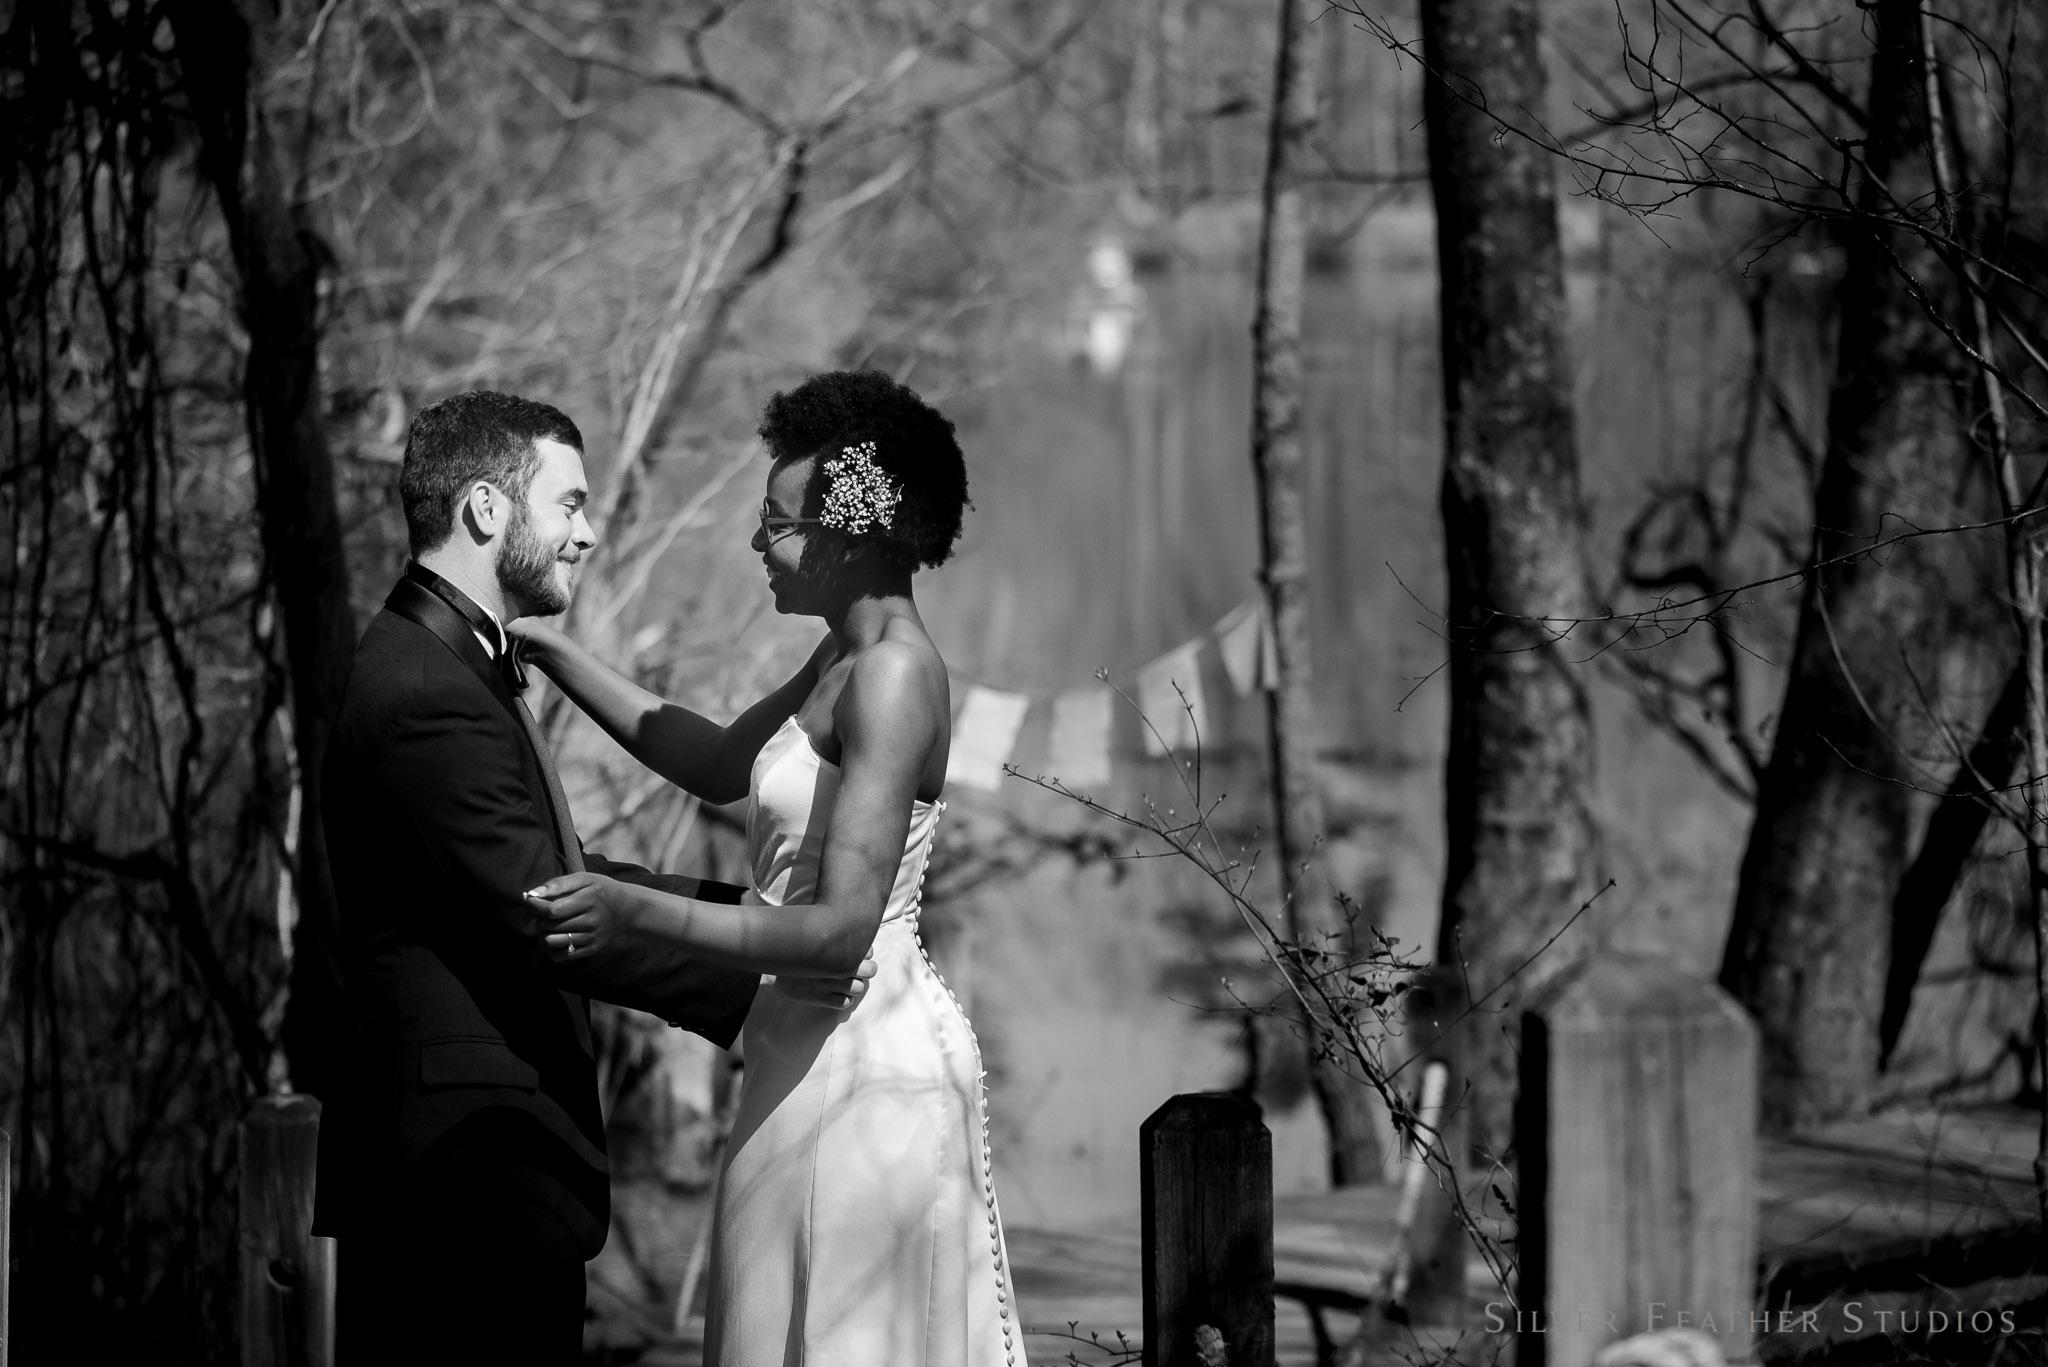 elon-university-wedding-photography-008.jpg